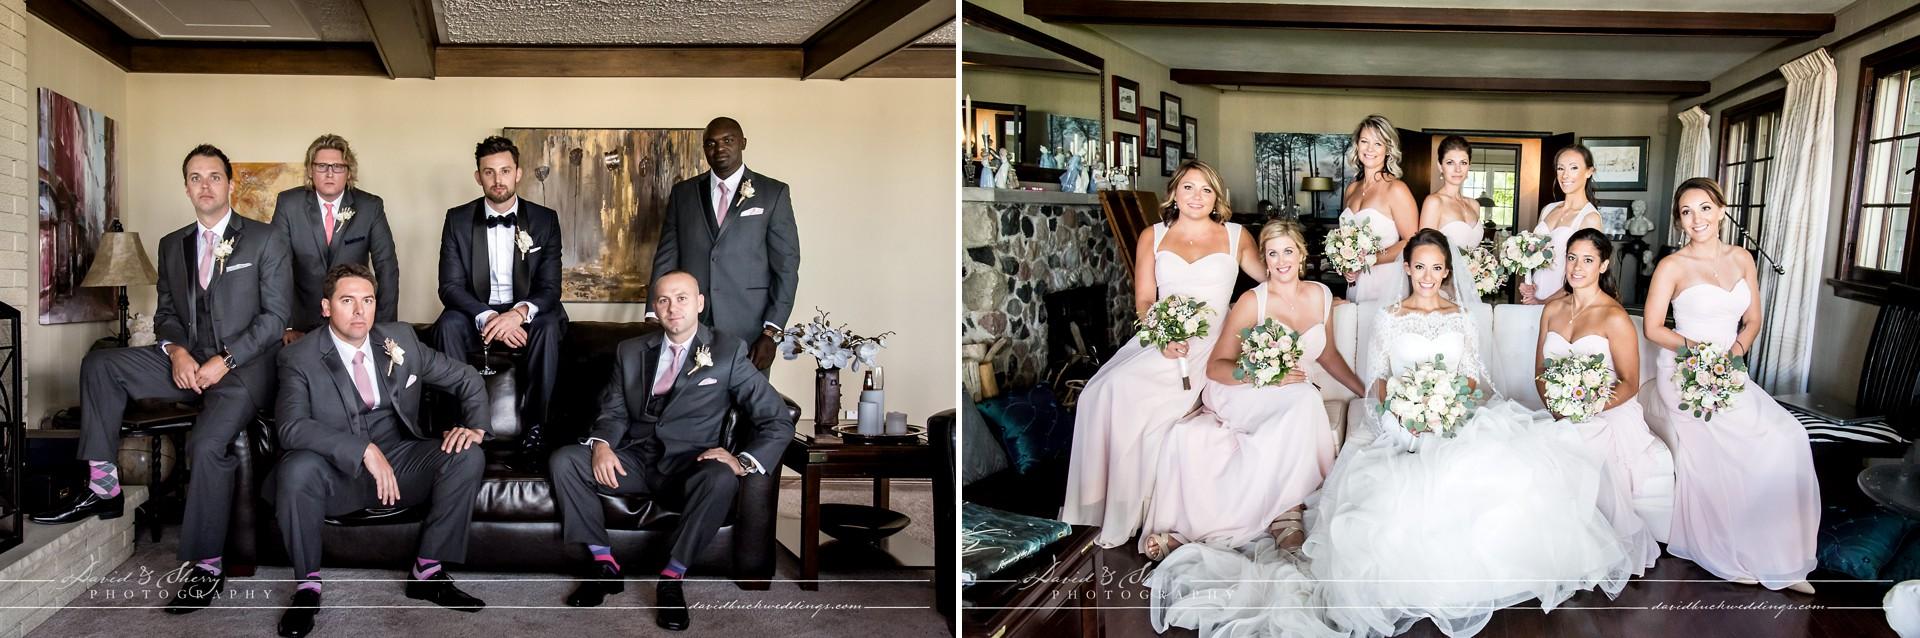 Sarnia_Wedding_Photography_022